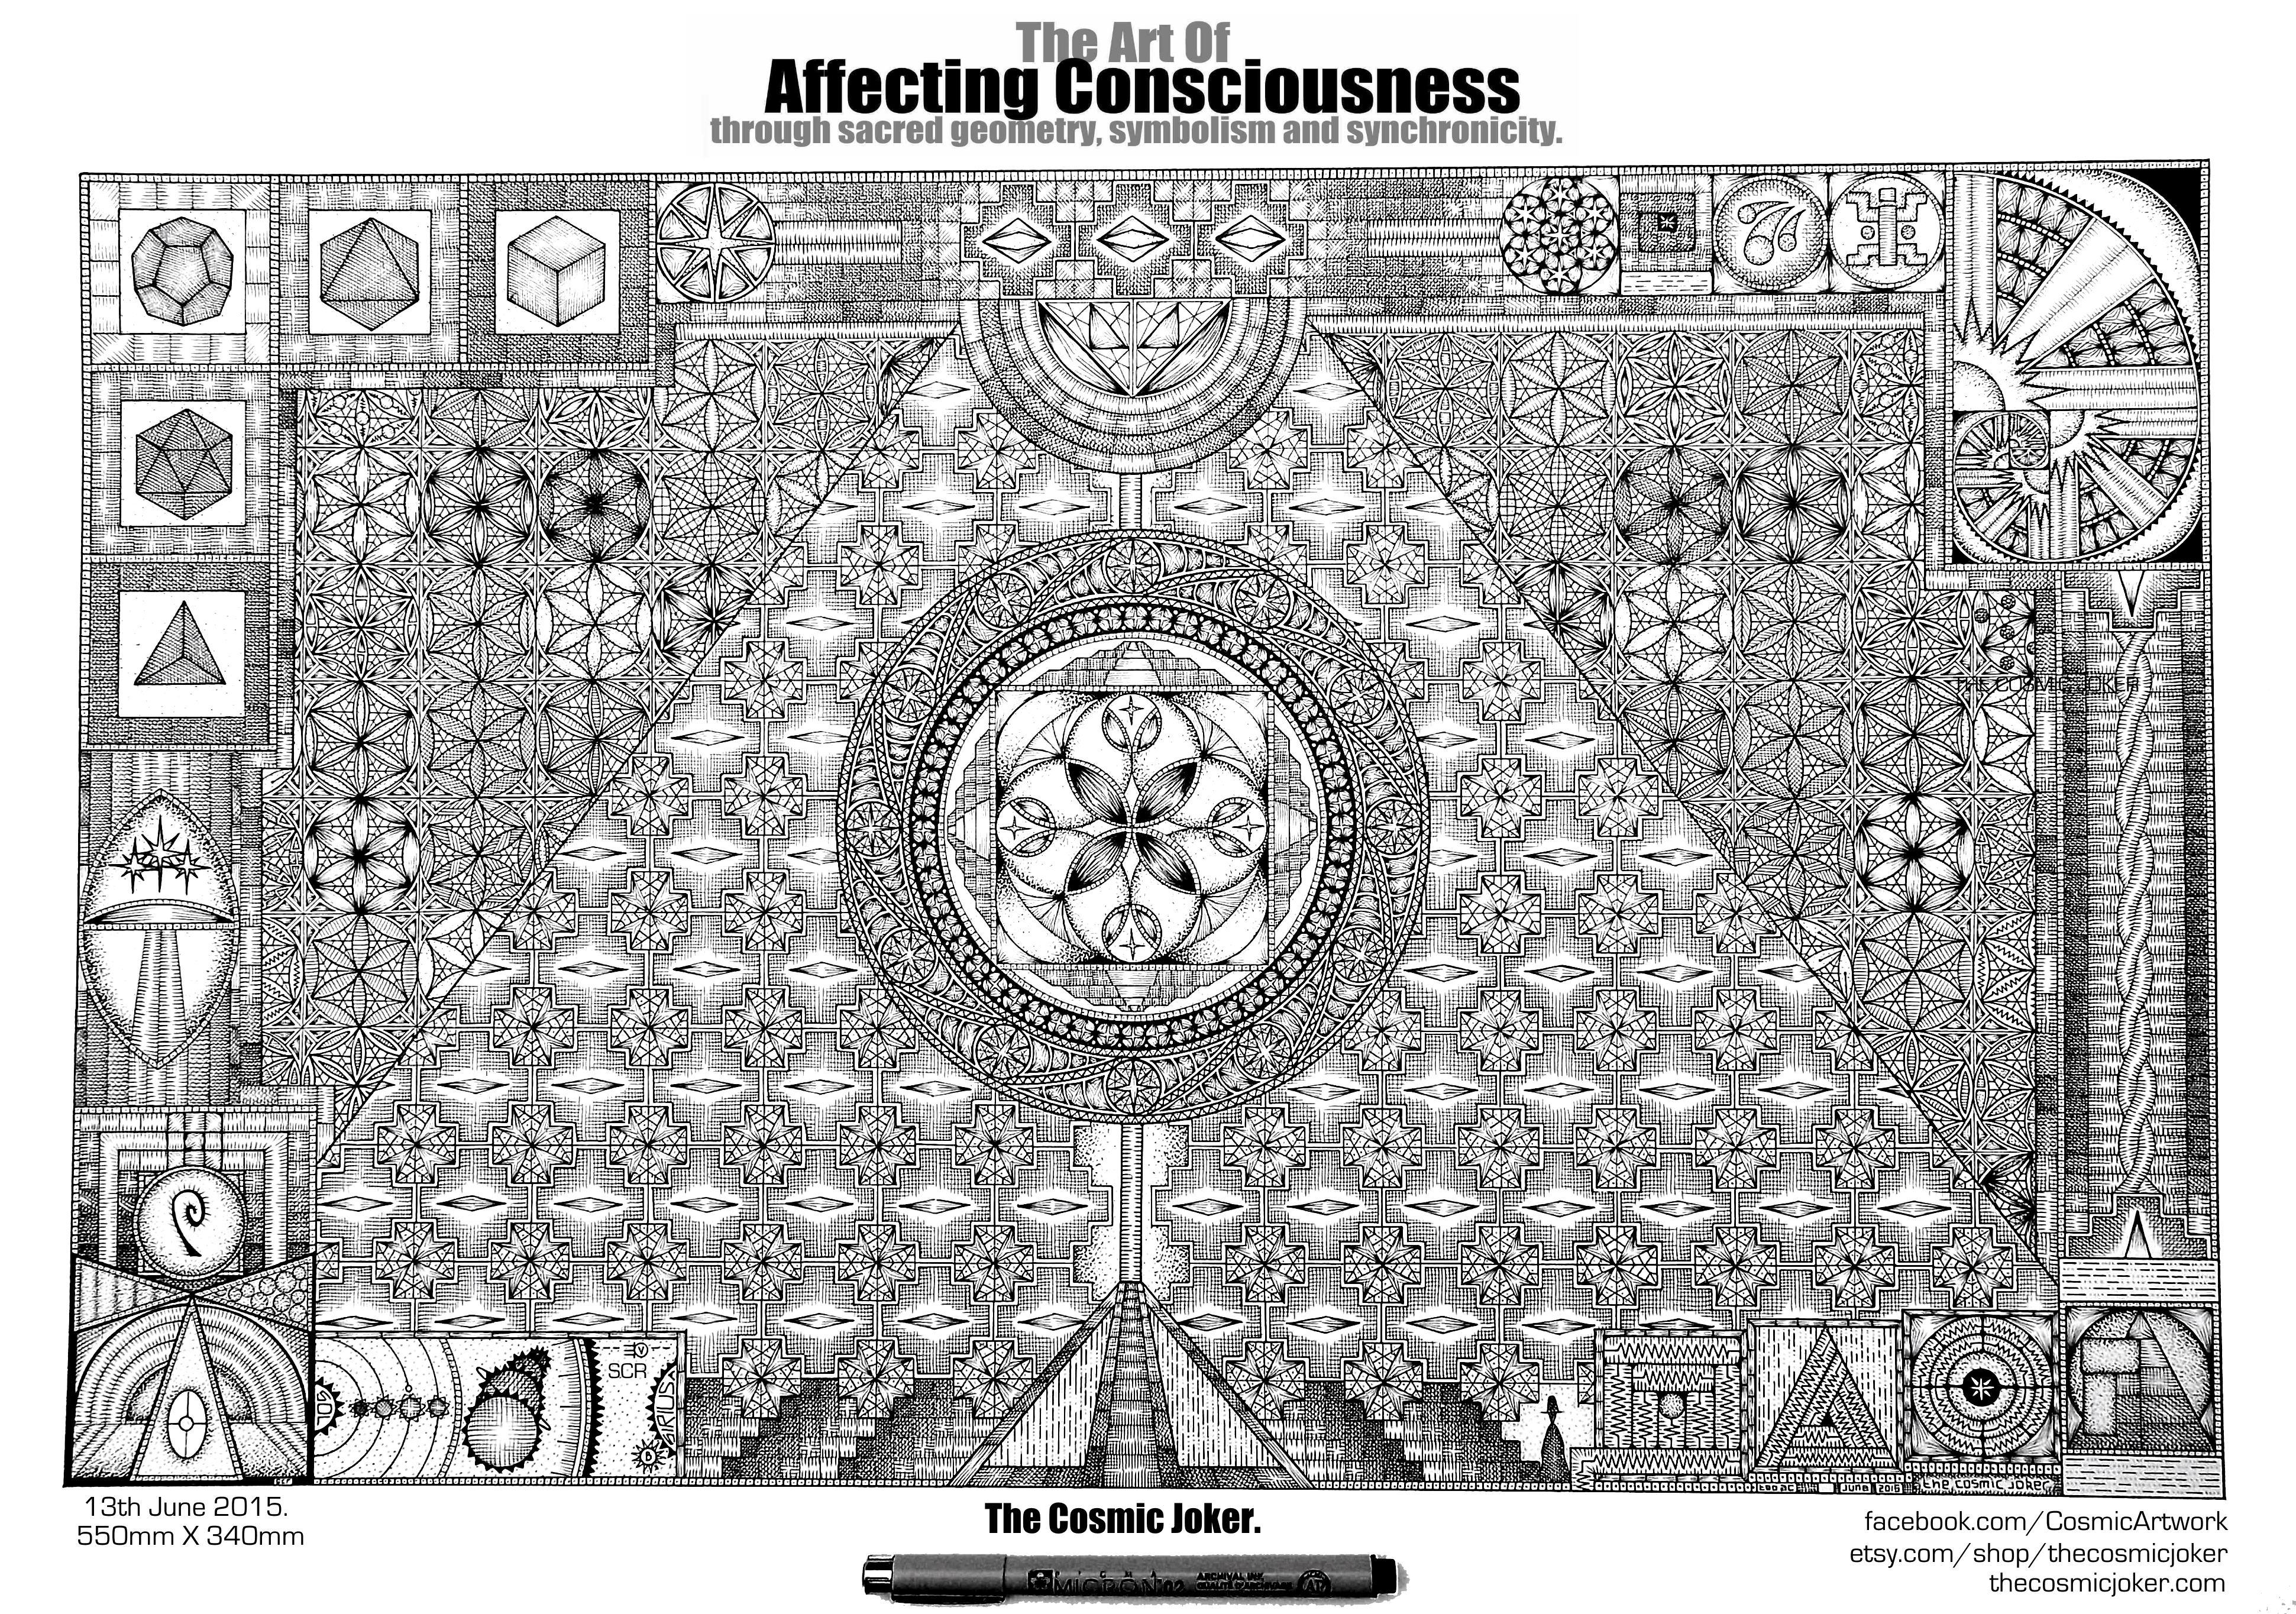 Zep tepi the art of affecting consciousness passport to hypnogogia biocorpaavc